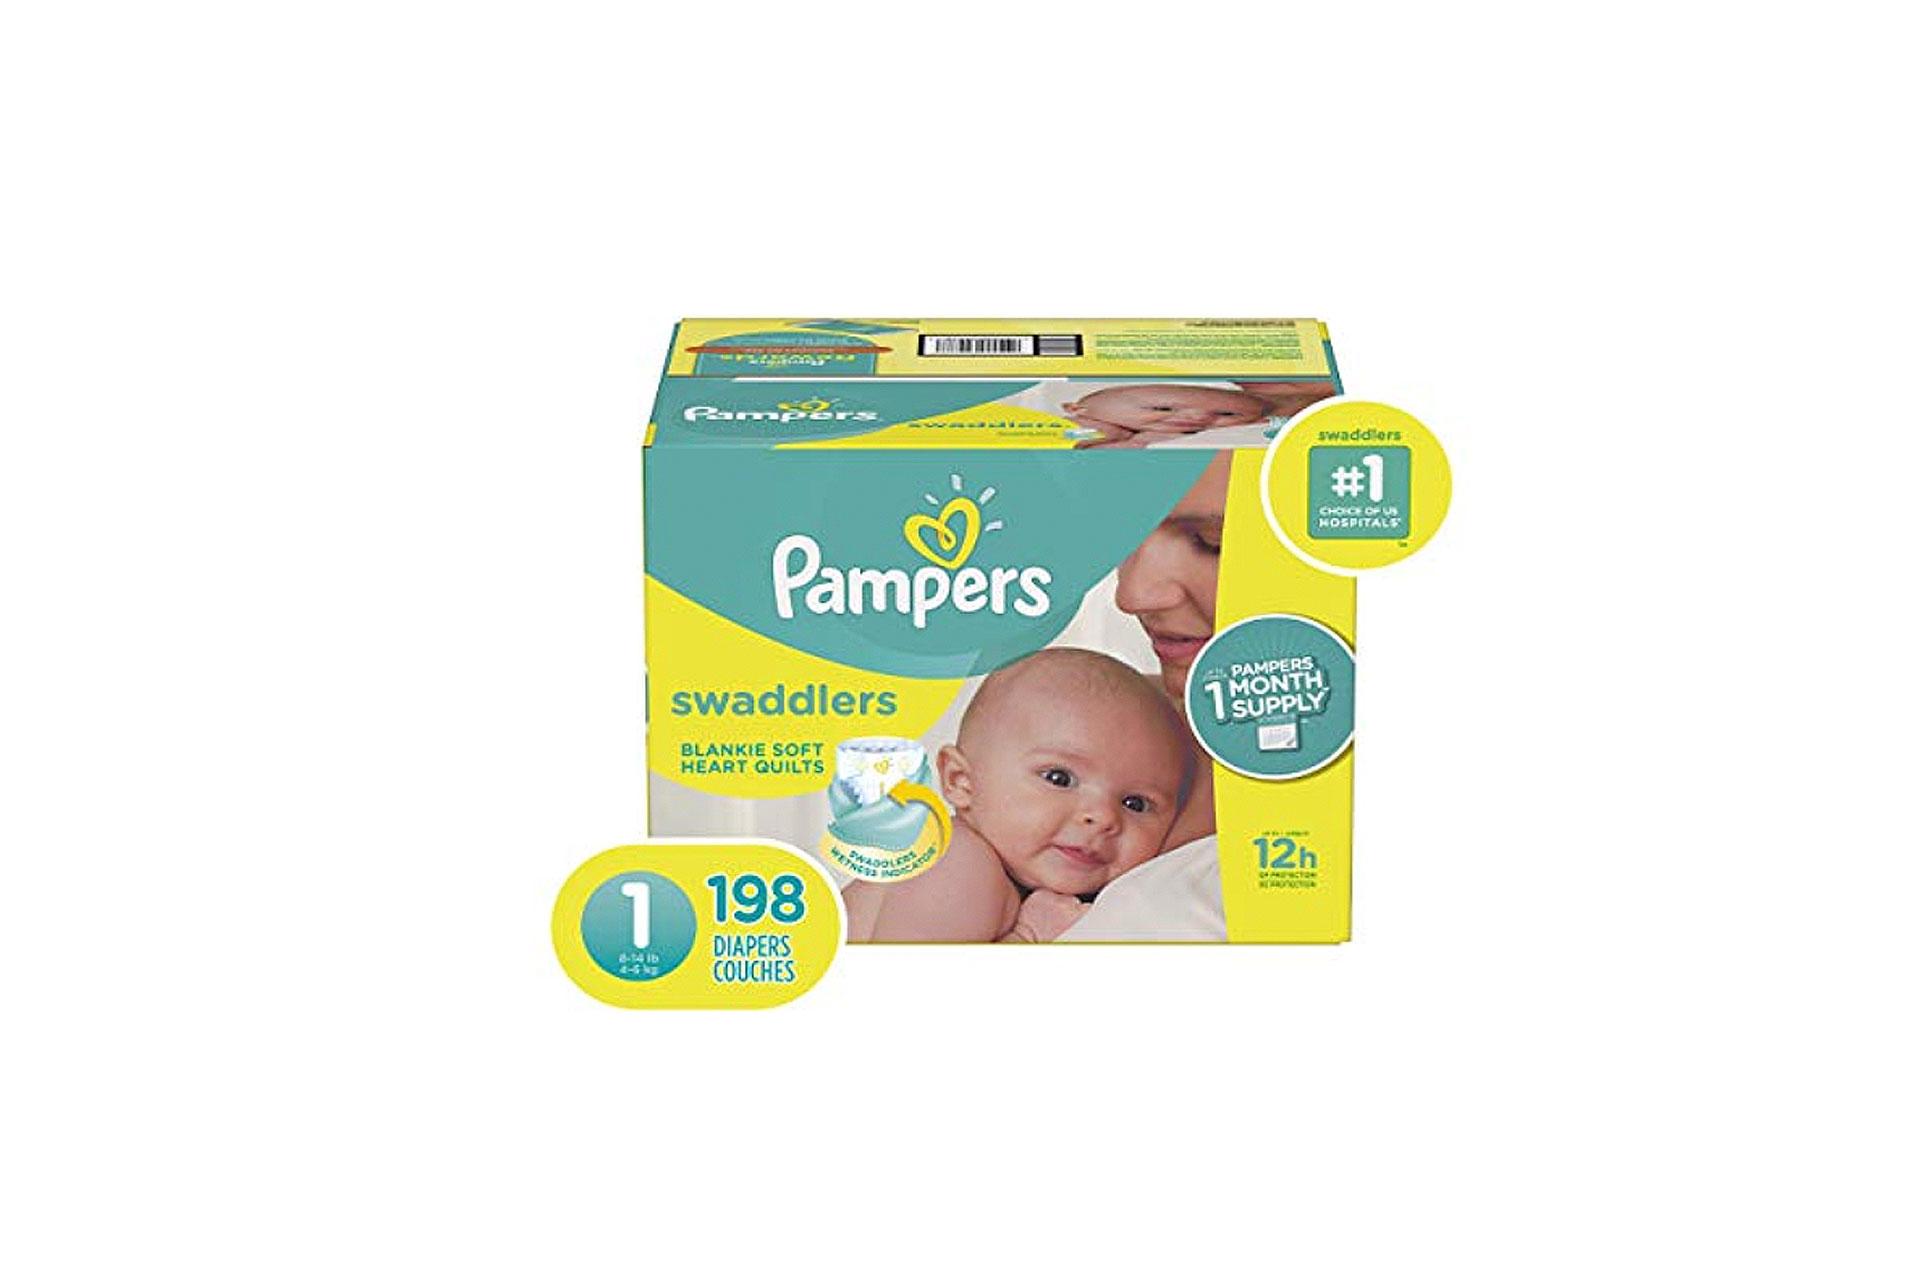 Diapers; Courtesy of Amazon